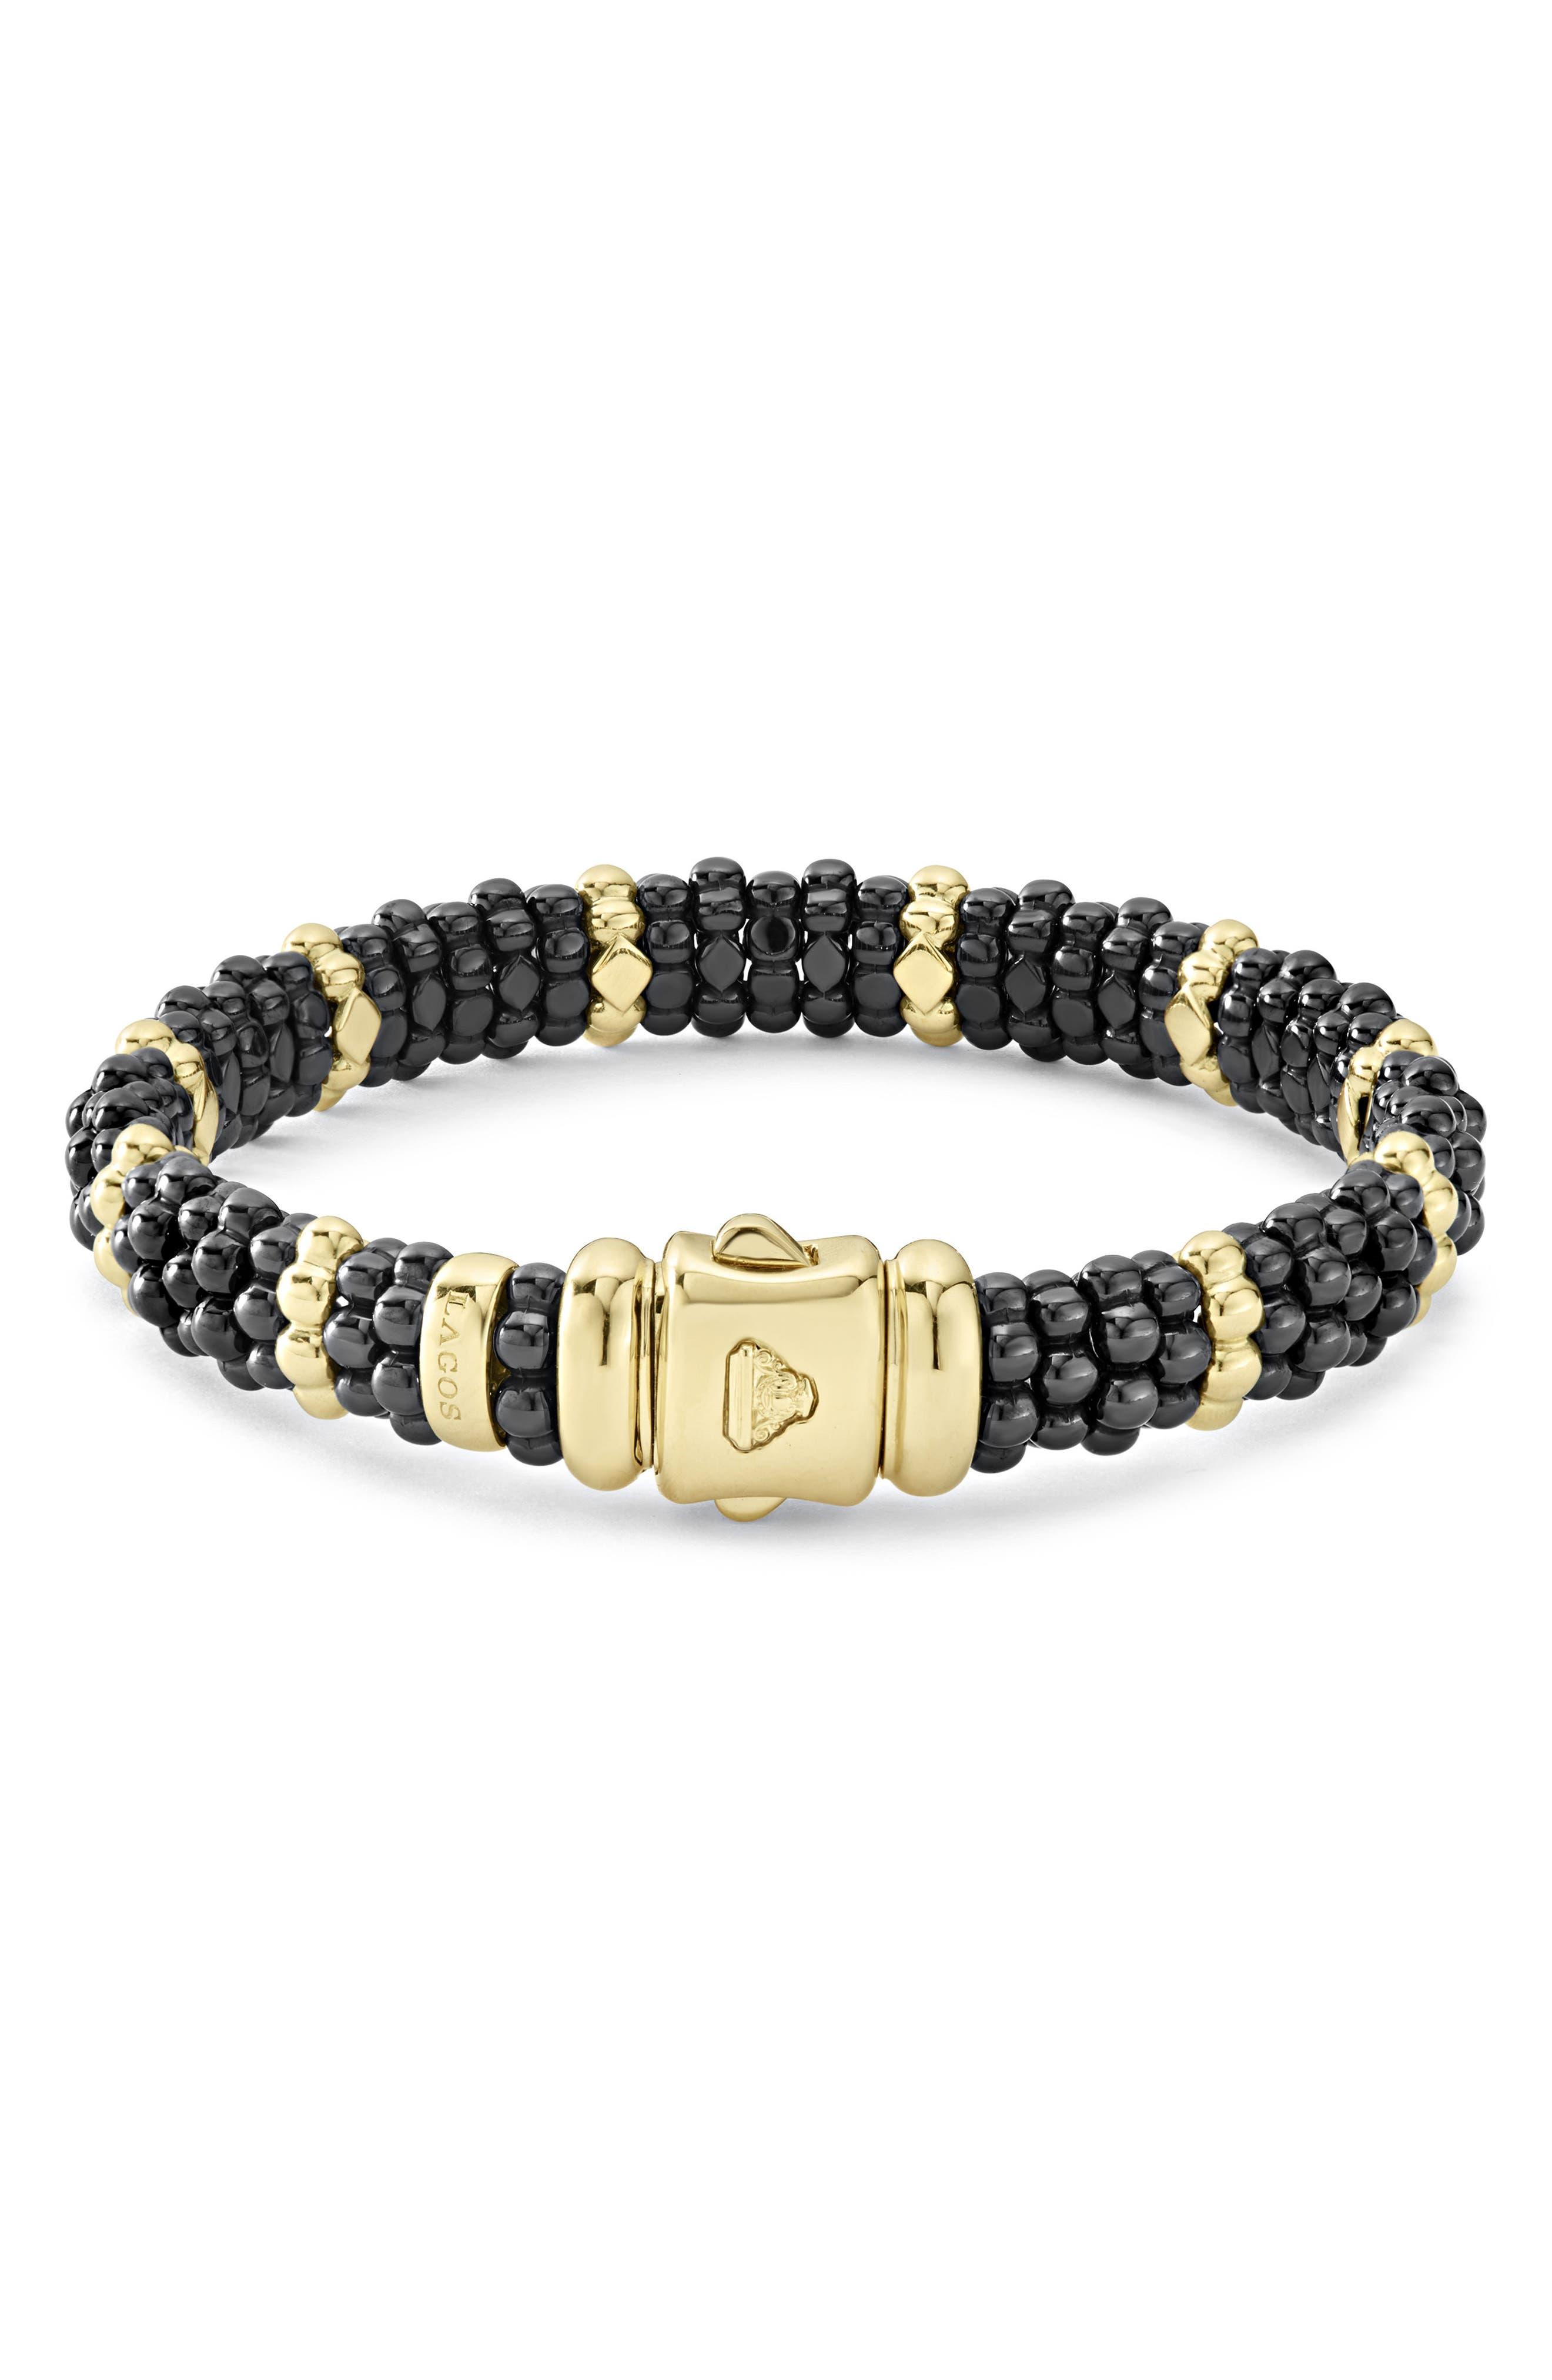 Gold & Black Caviar Station Bracelet,                             Alternate thumbnail 3, color,                             GOLD/ BLACK